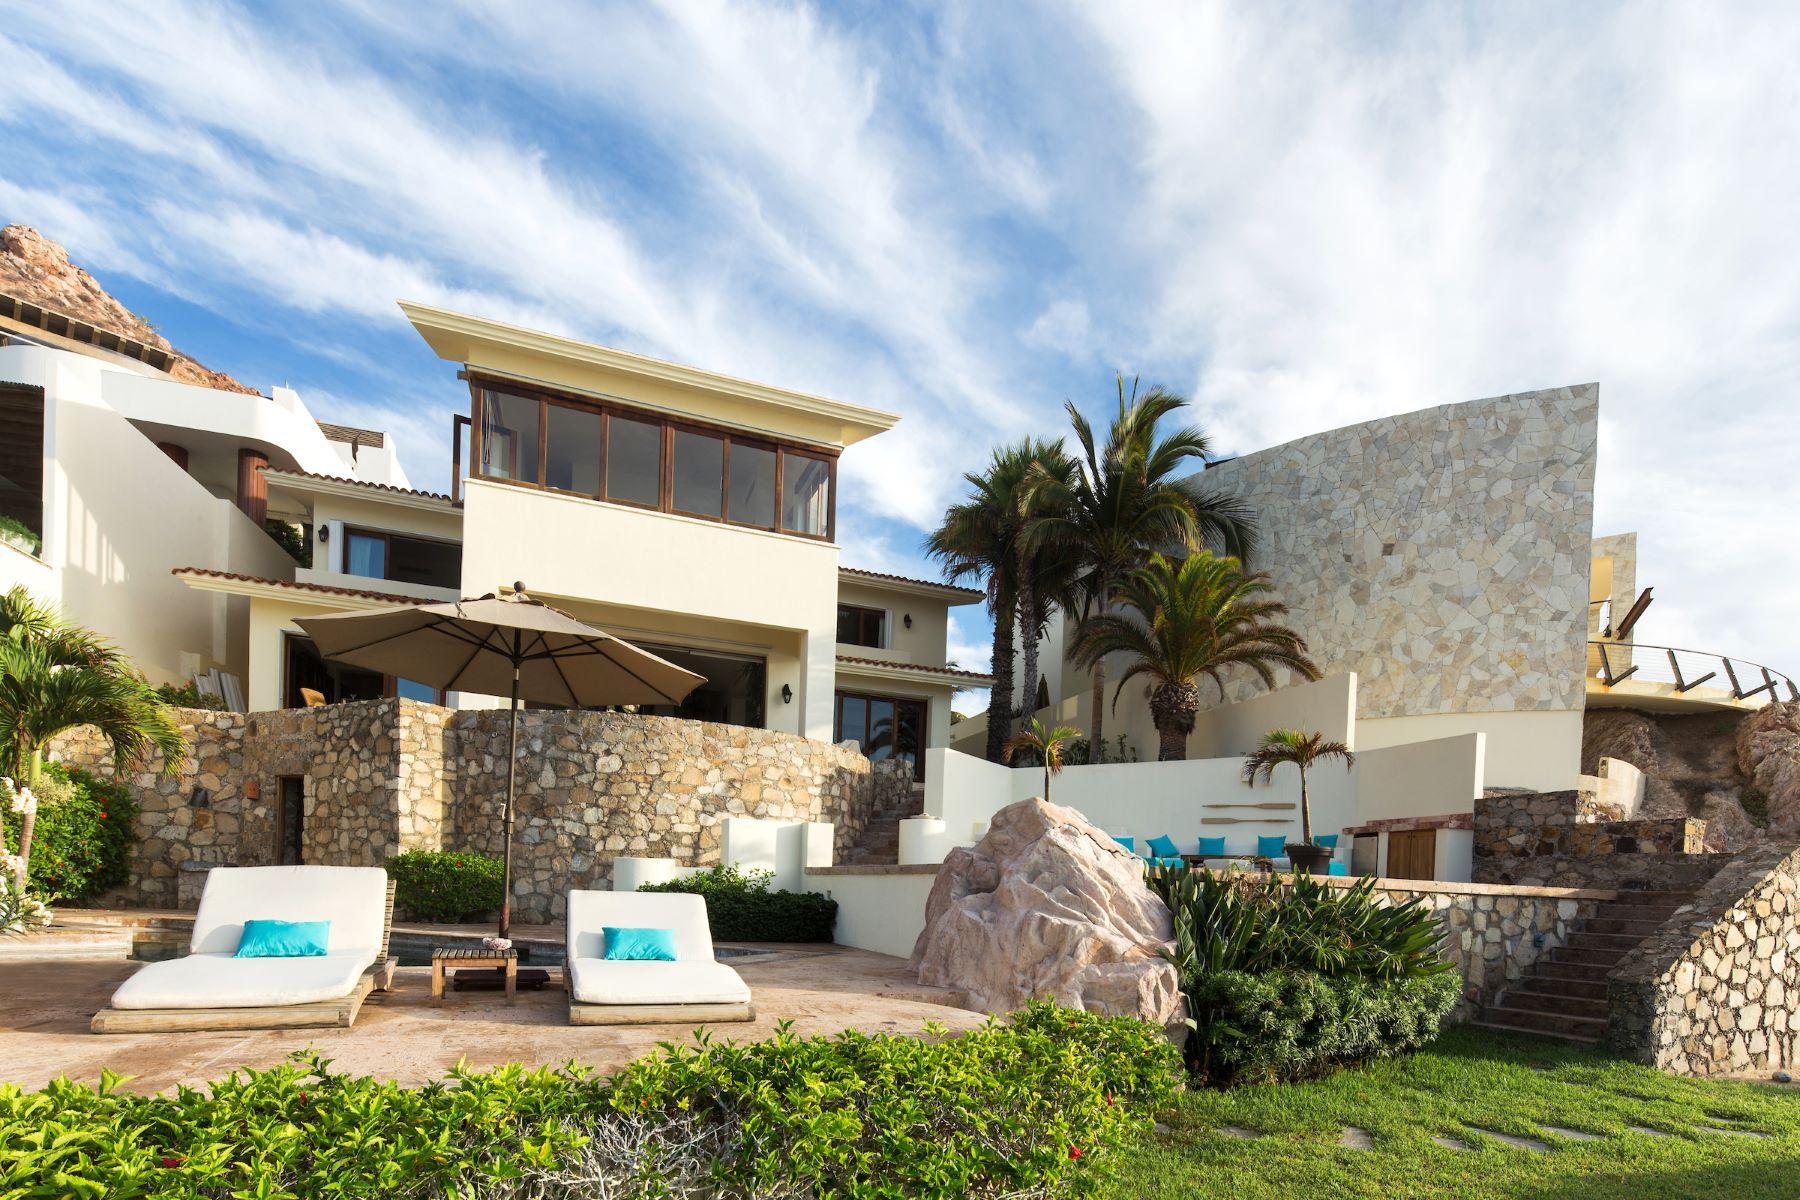 Additional photo for property listing at Casa Barbara San Jose Del Cabo, Baja California Sur México